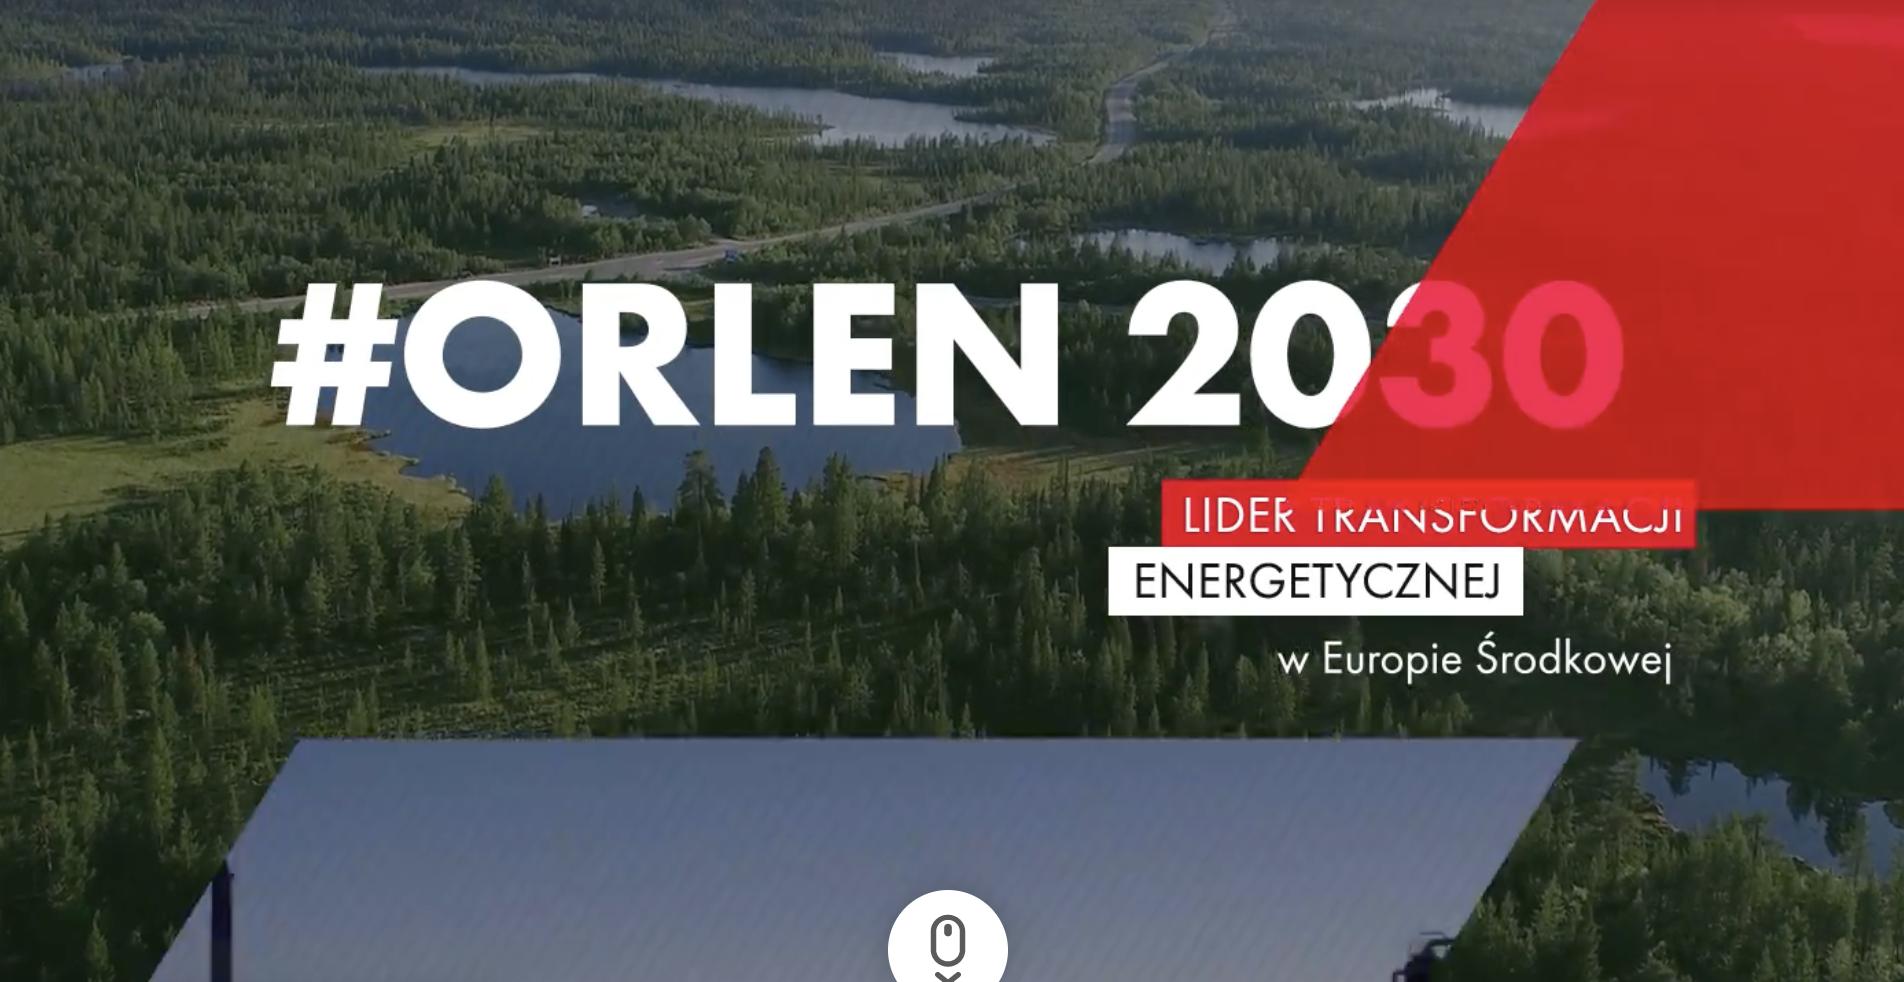 Raport Zintegrowany Grupy ORLEN 2020